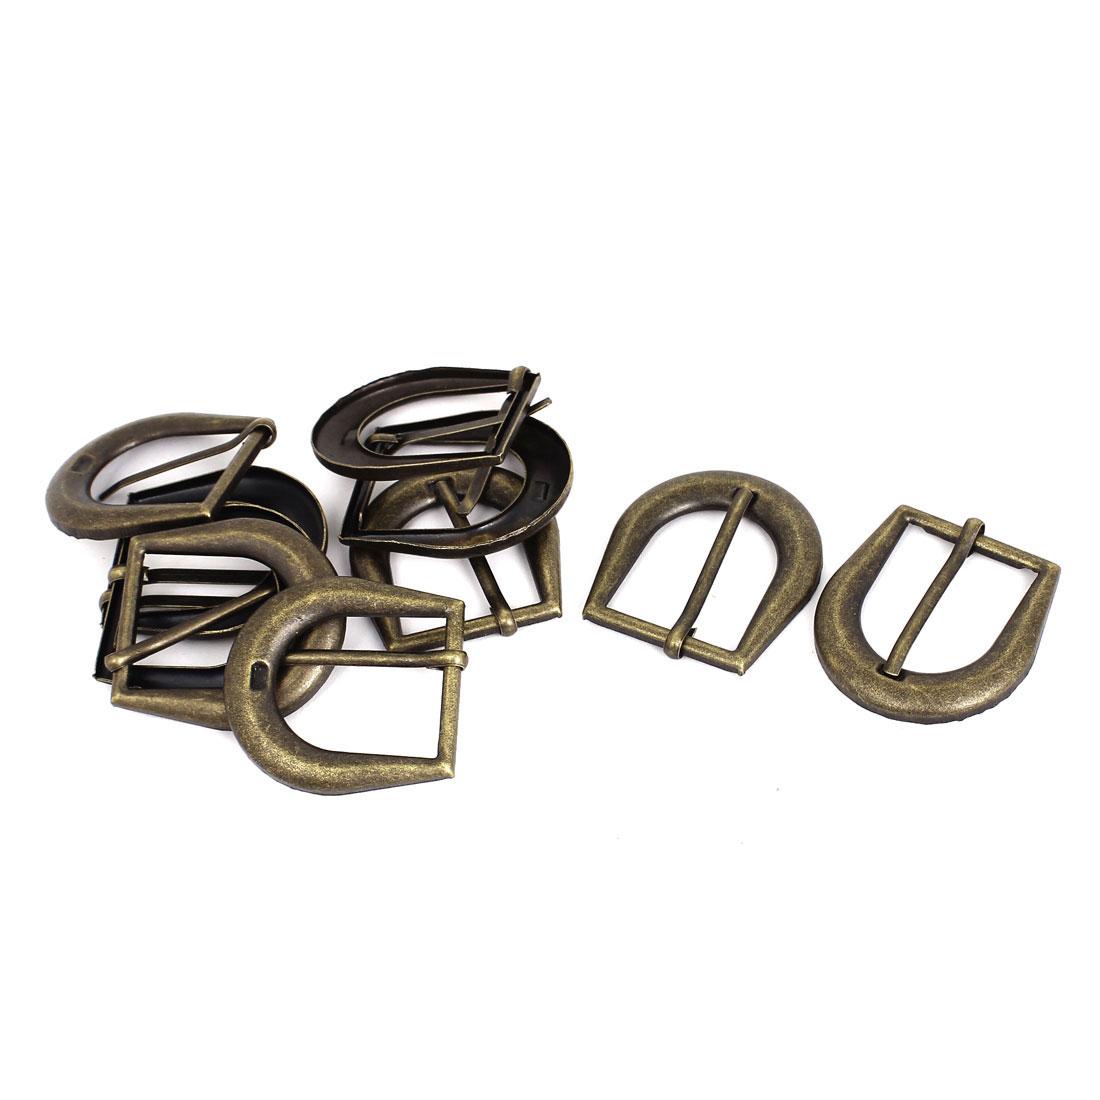 Leather Bag Clothes Vintage Style Metal Single Pin Buckles Bronze Tone 10Pcs